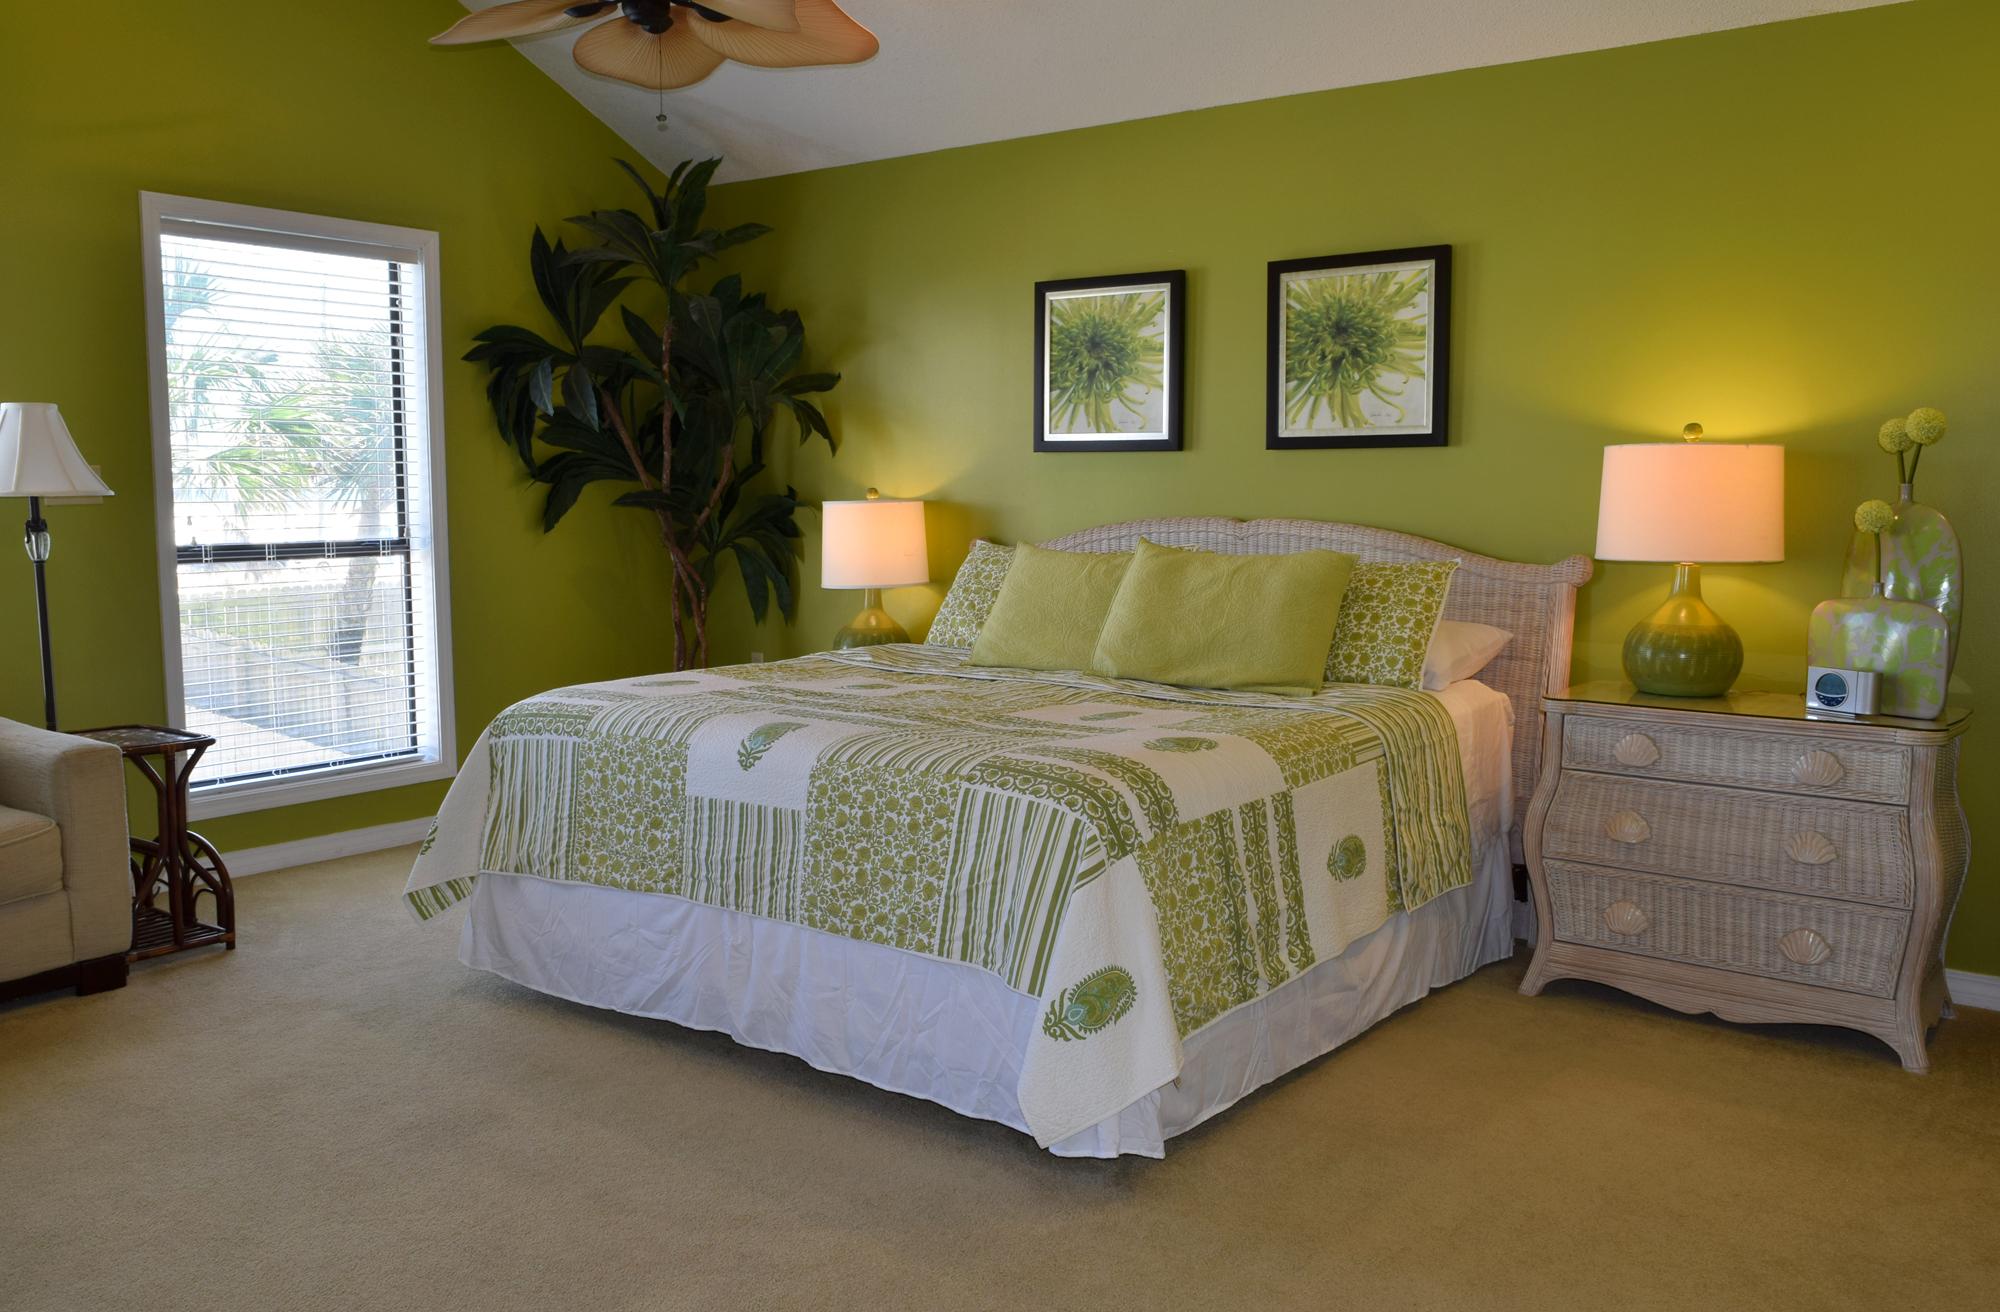 Maldonado 1010 House/Cottage rental in Pensacola Beach House Rentals in Pensacola Beach Florida - #24